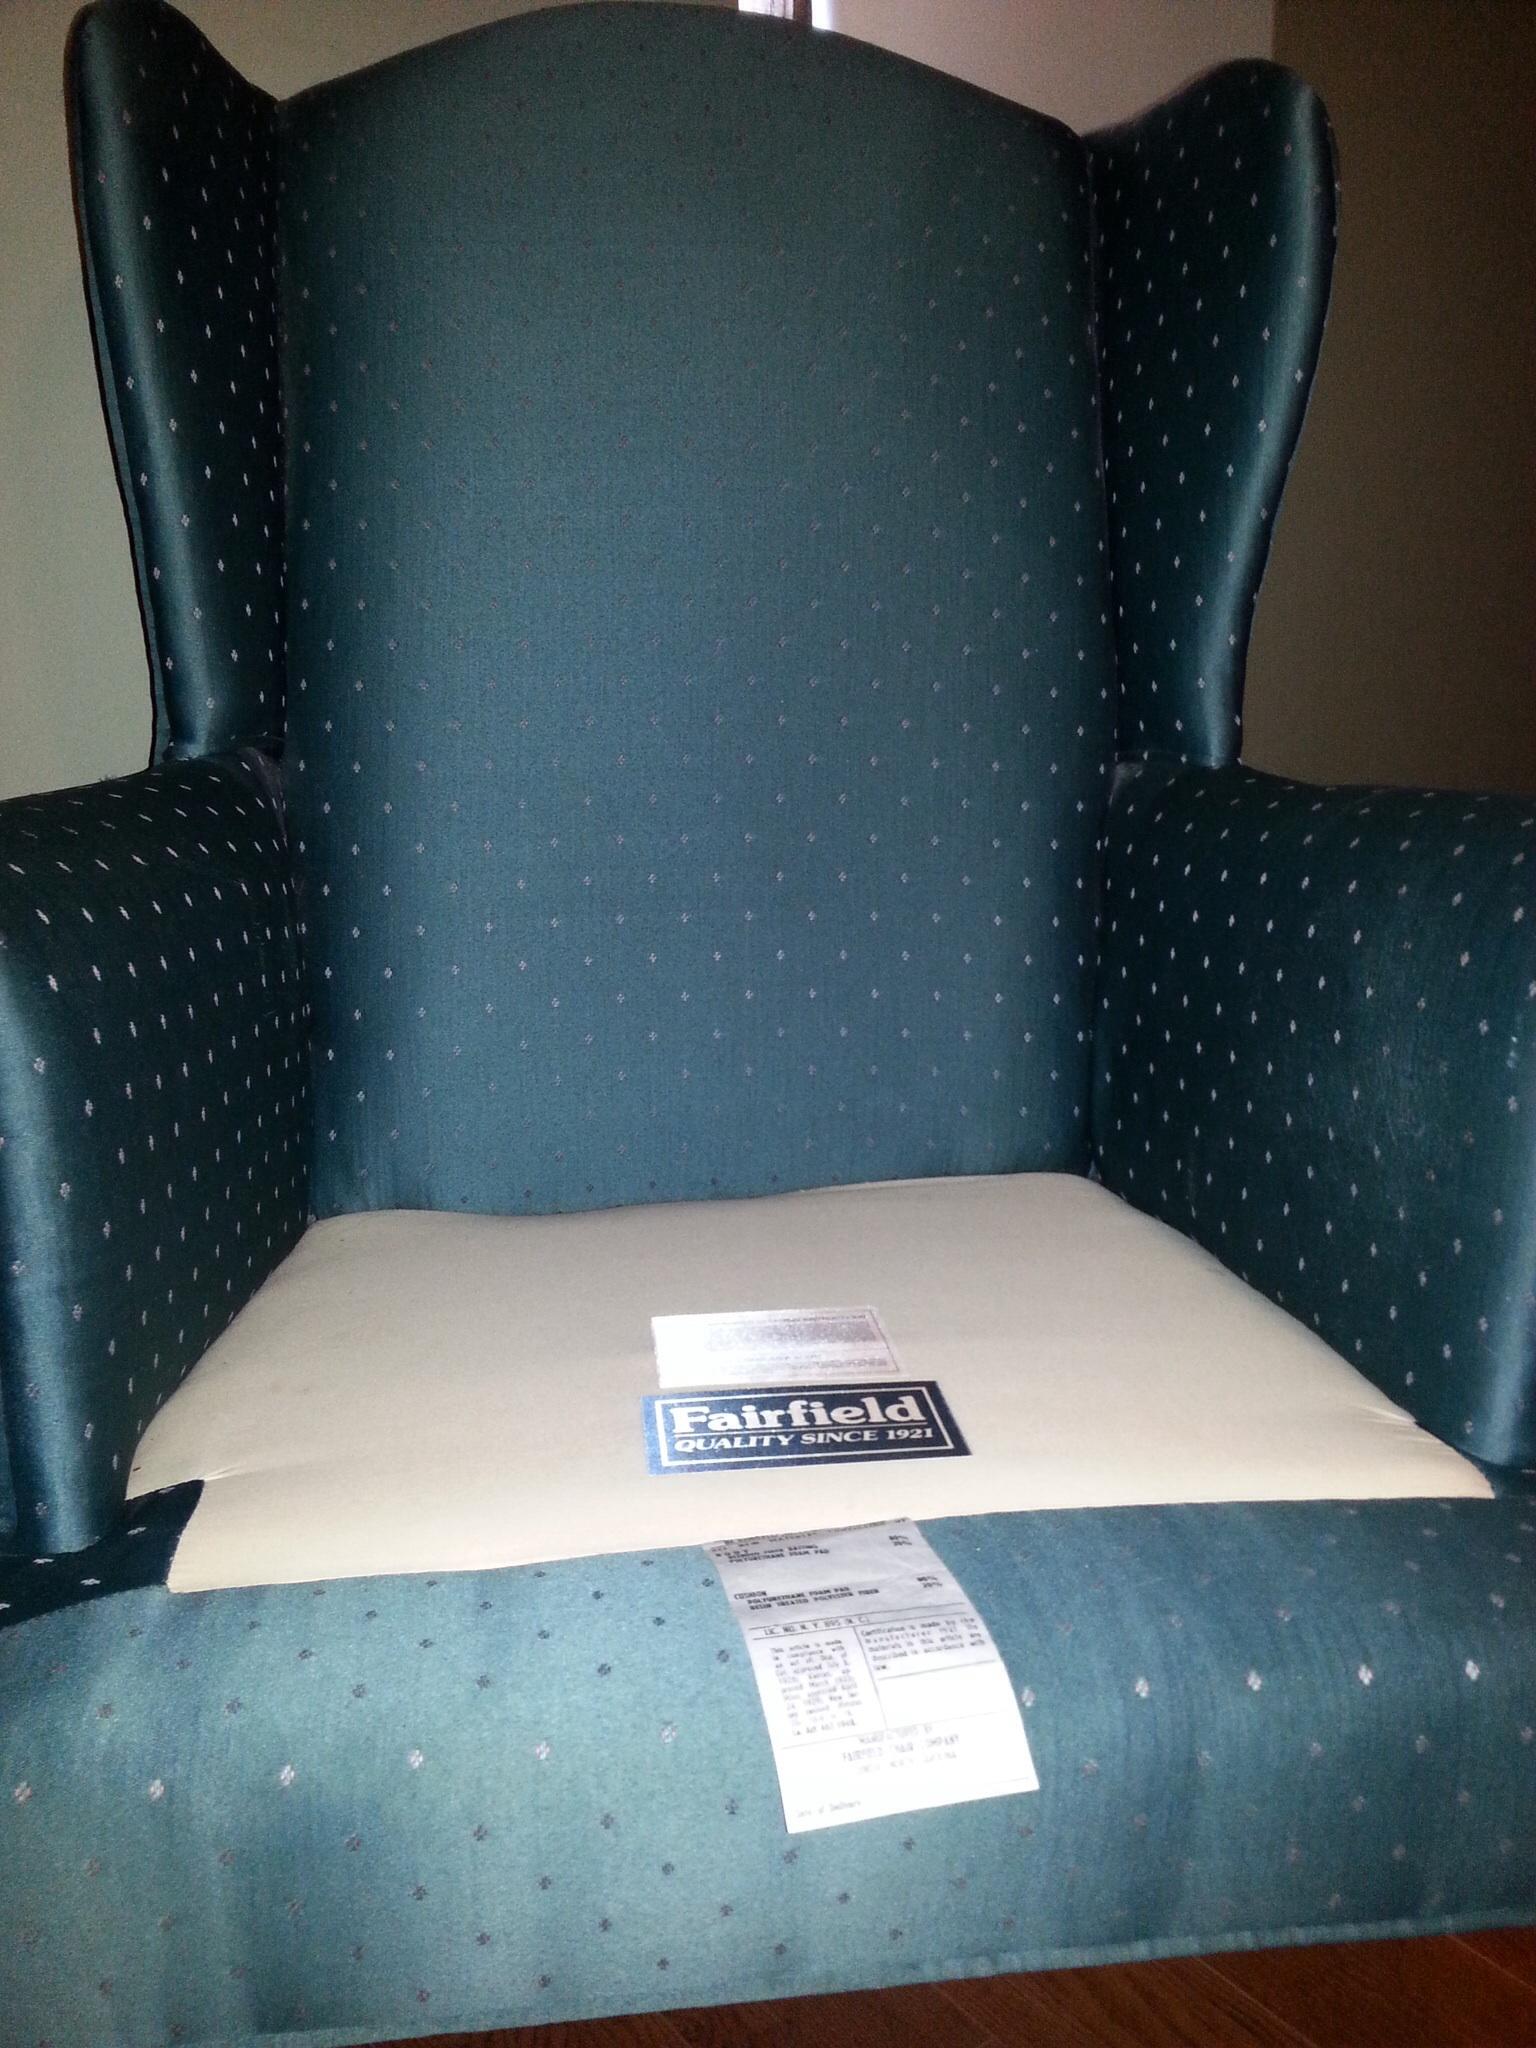 2 Fairfield Chair Company Wingback Chairs